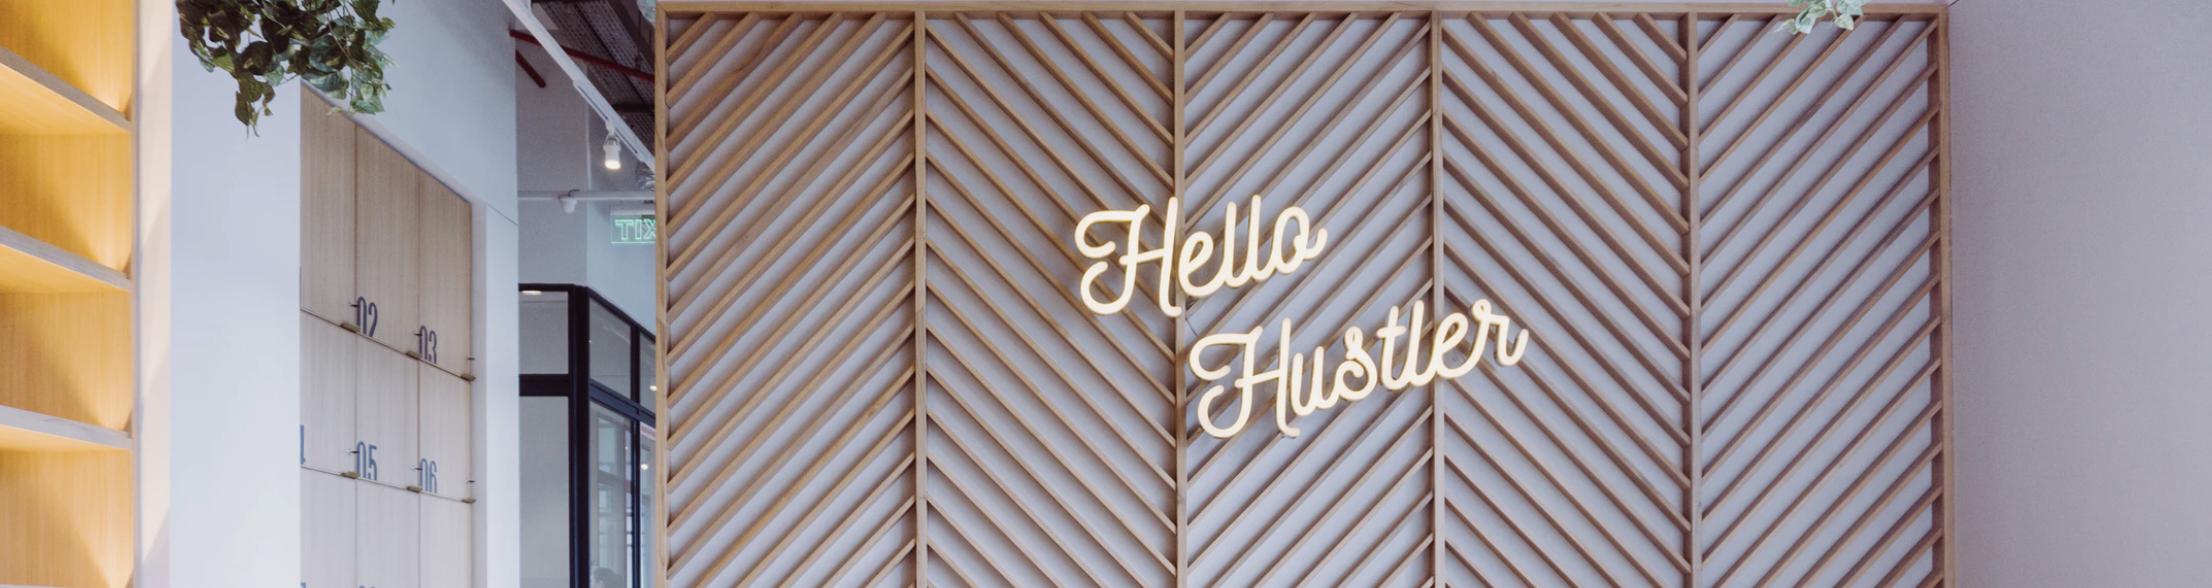 Hello hustler image